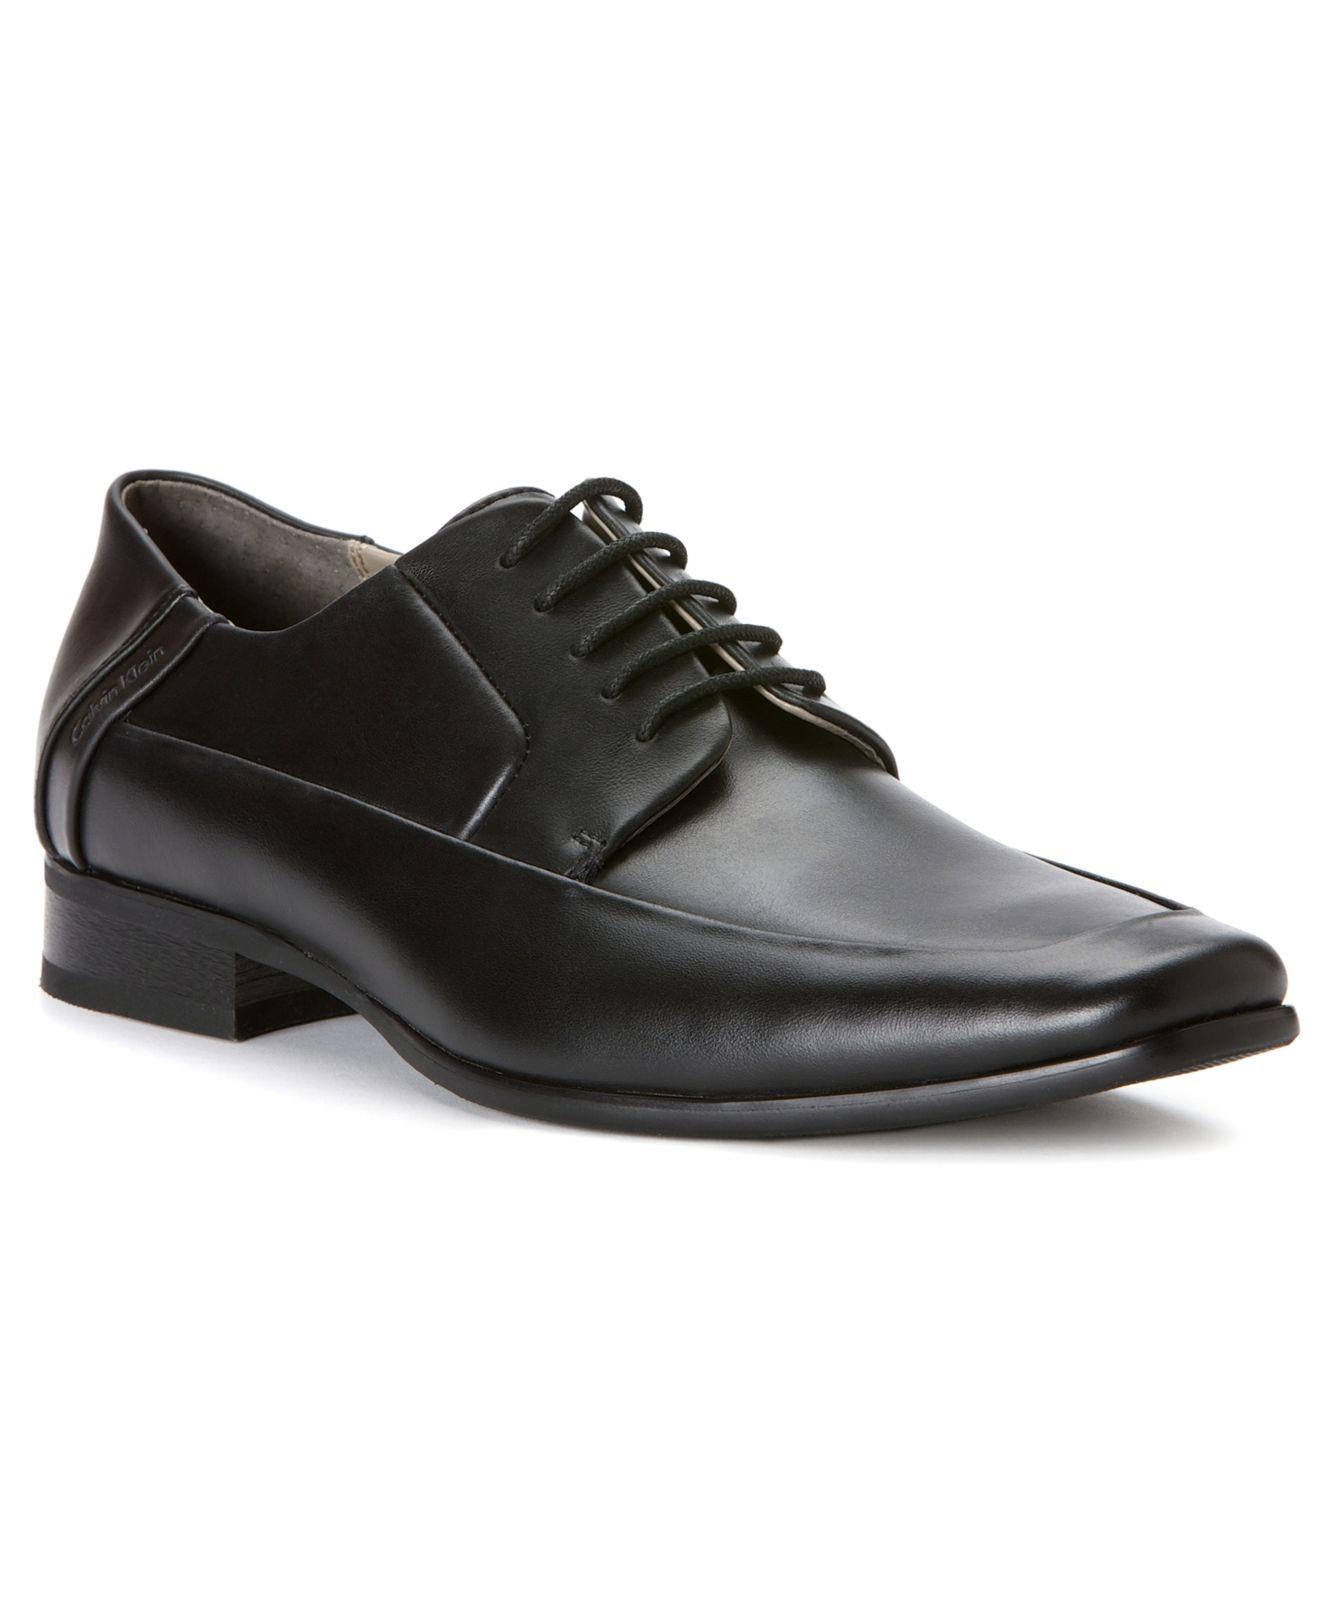 Calvin Klein Brent Moc Toe Lace Up Shoes In Black For Men